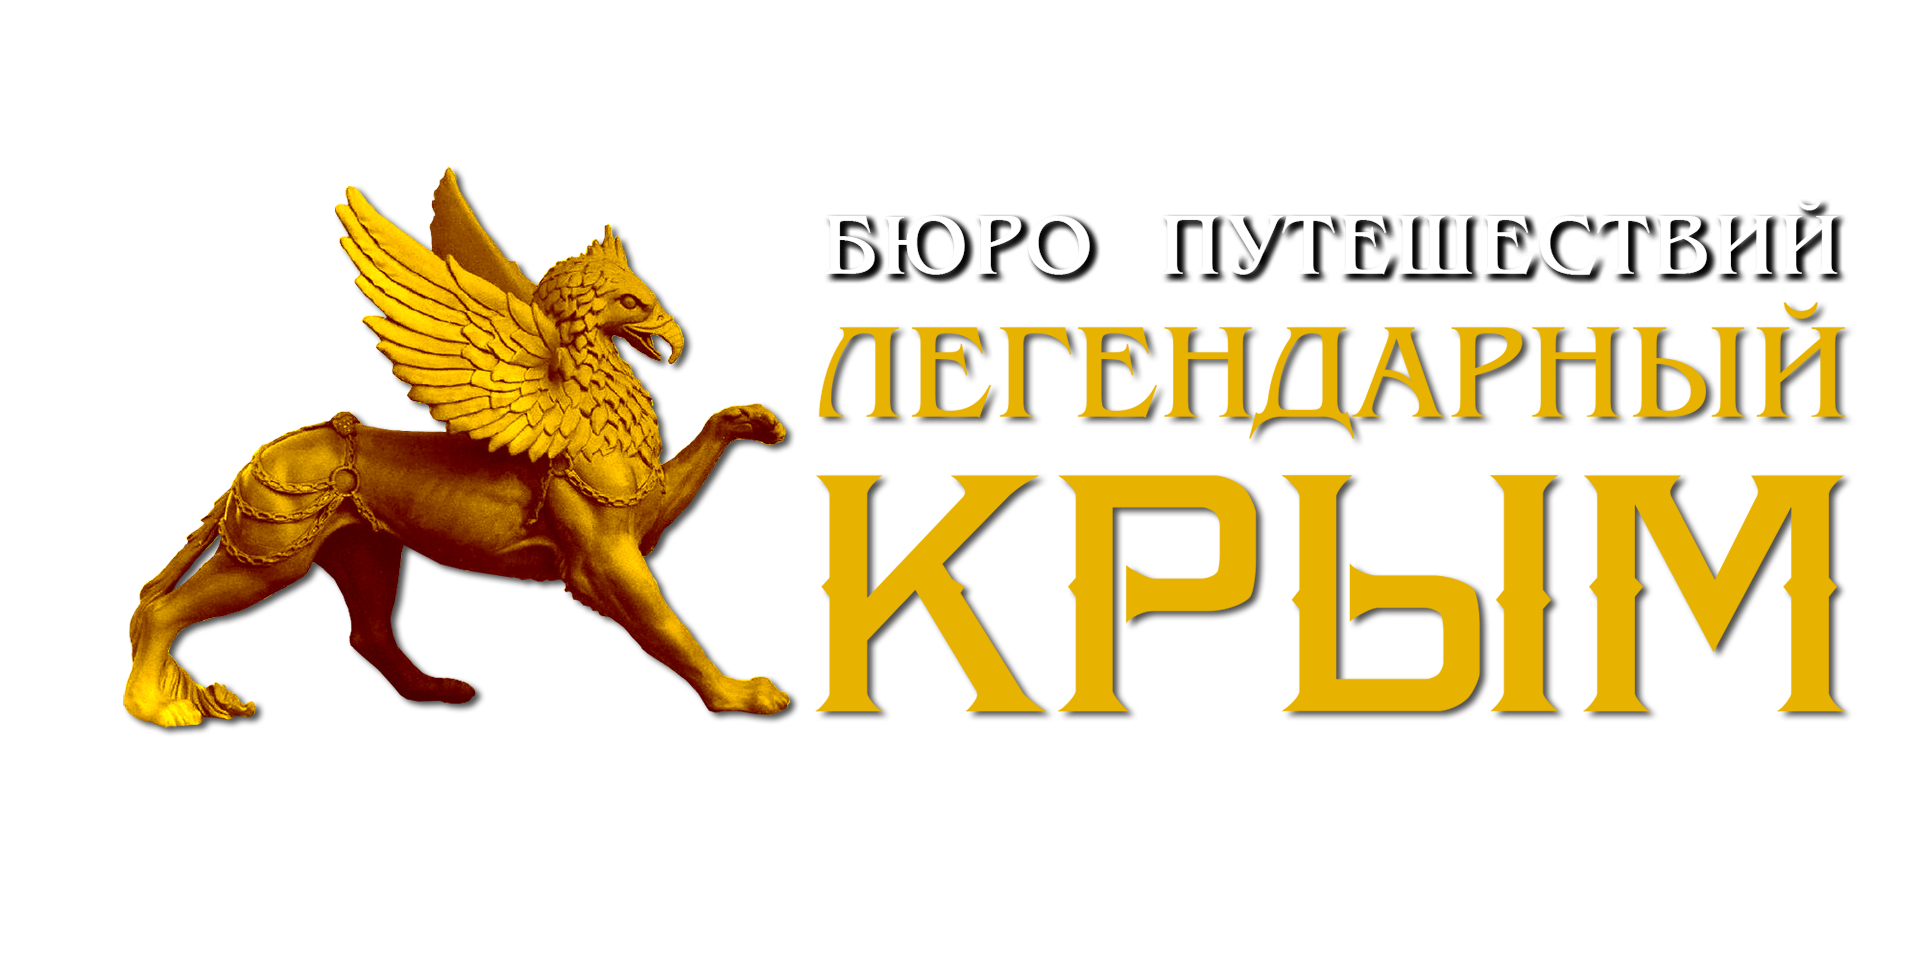 Бюро путешествий «Легендарный Крым»